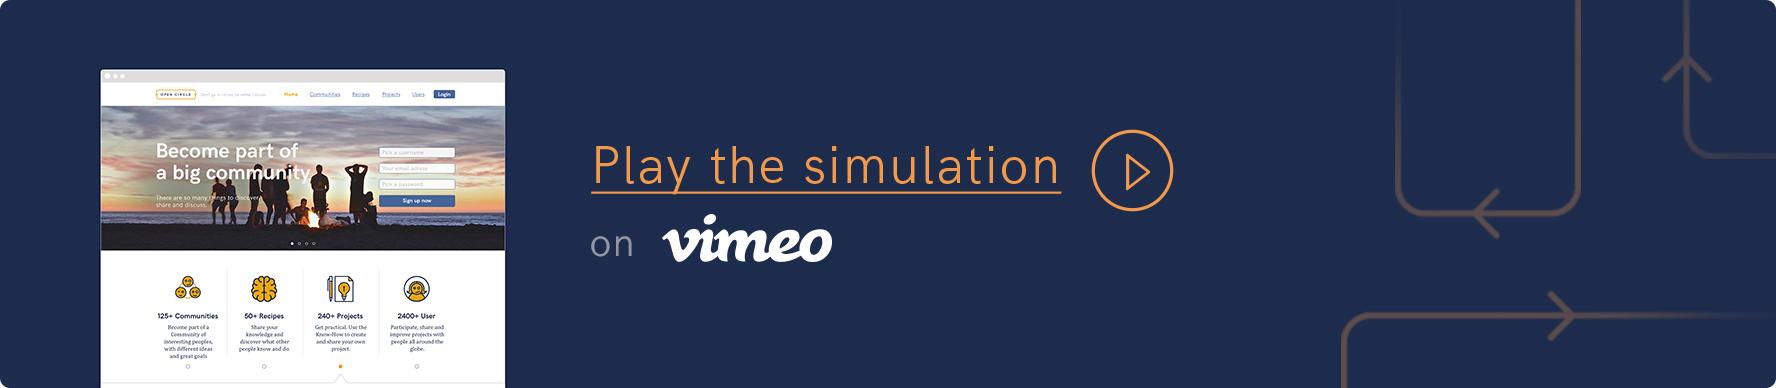 Video simulation of the platform